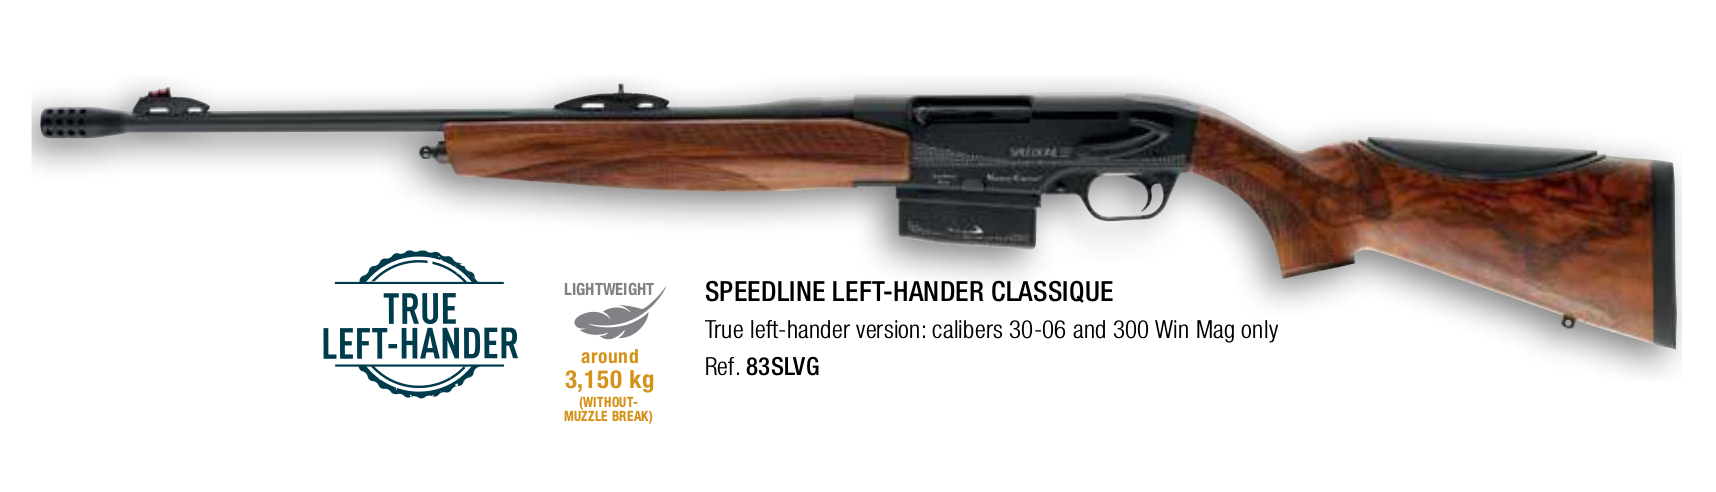 Verney-Carron Speedline Classique Left Hand rifle